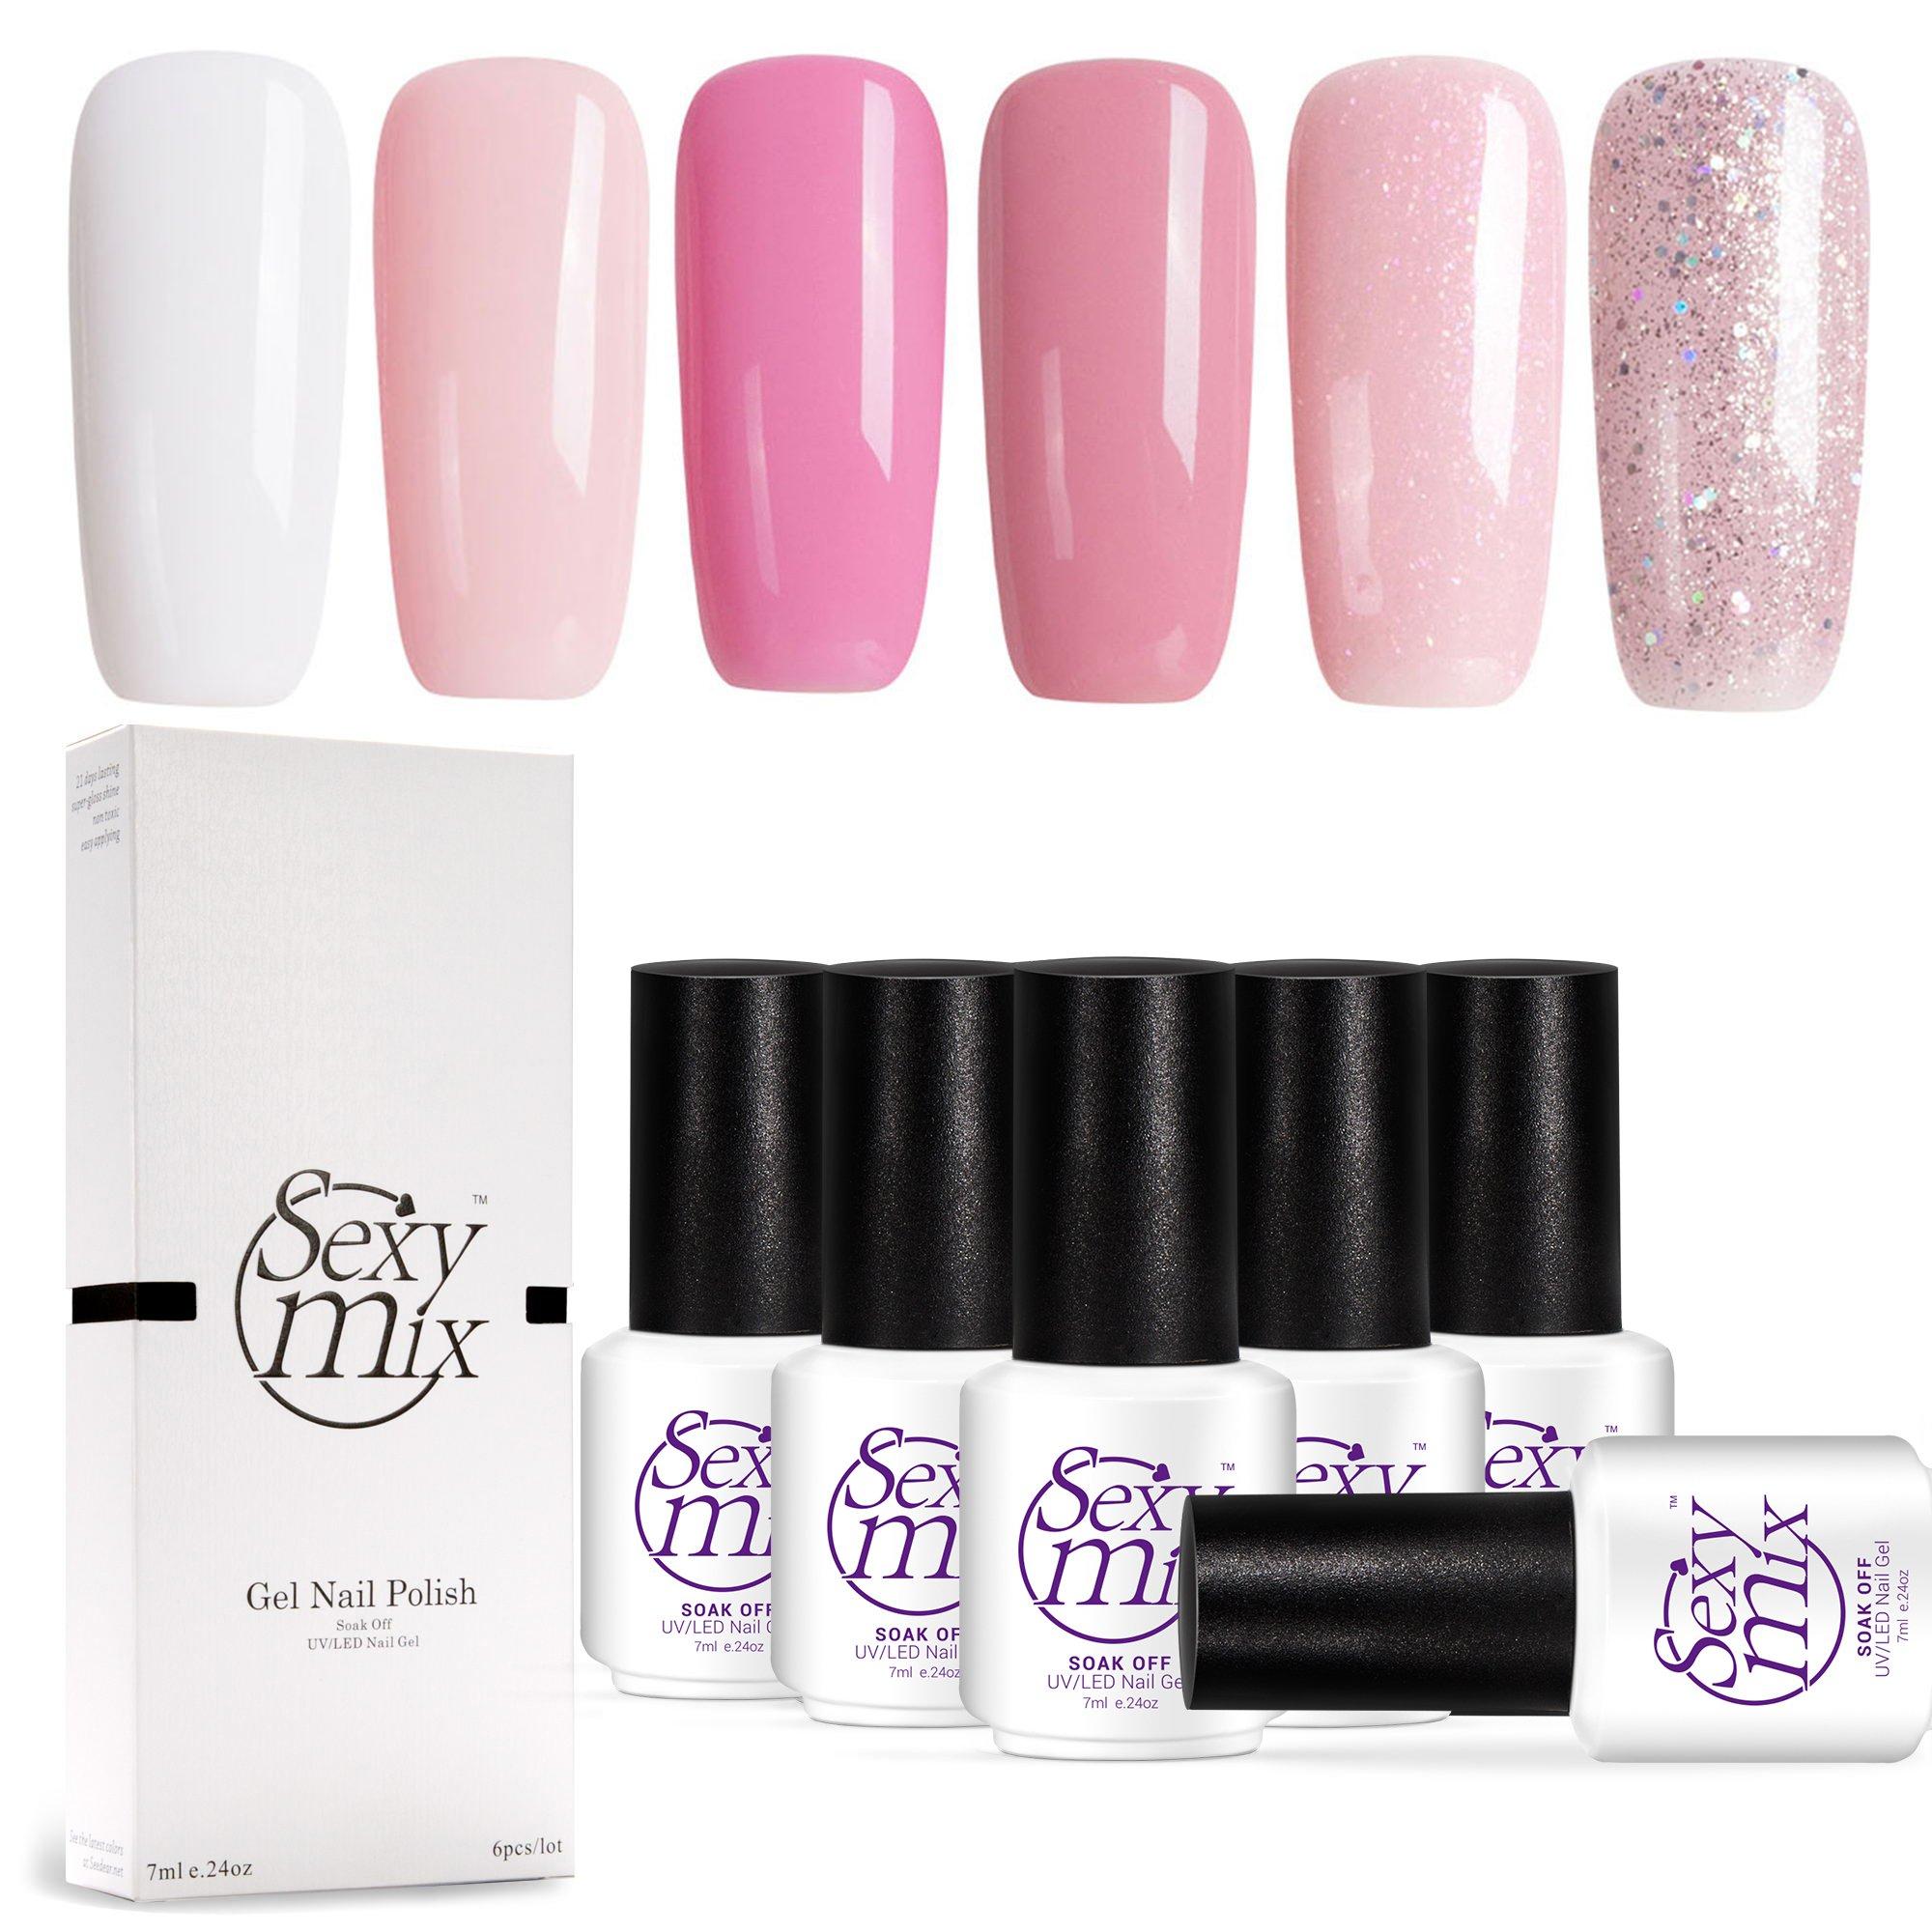 Gel Nail Polish for Nails, Soak Off UV Pink Gel Kit Required Gel Base Top Coat LED Nail Lamp by SEXY MIX